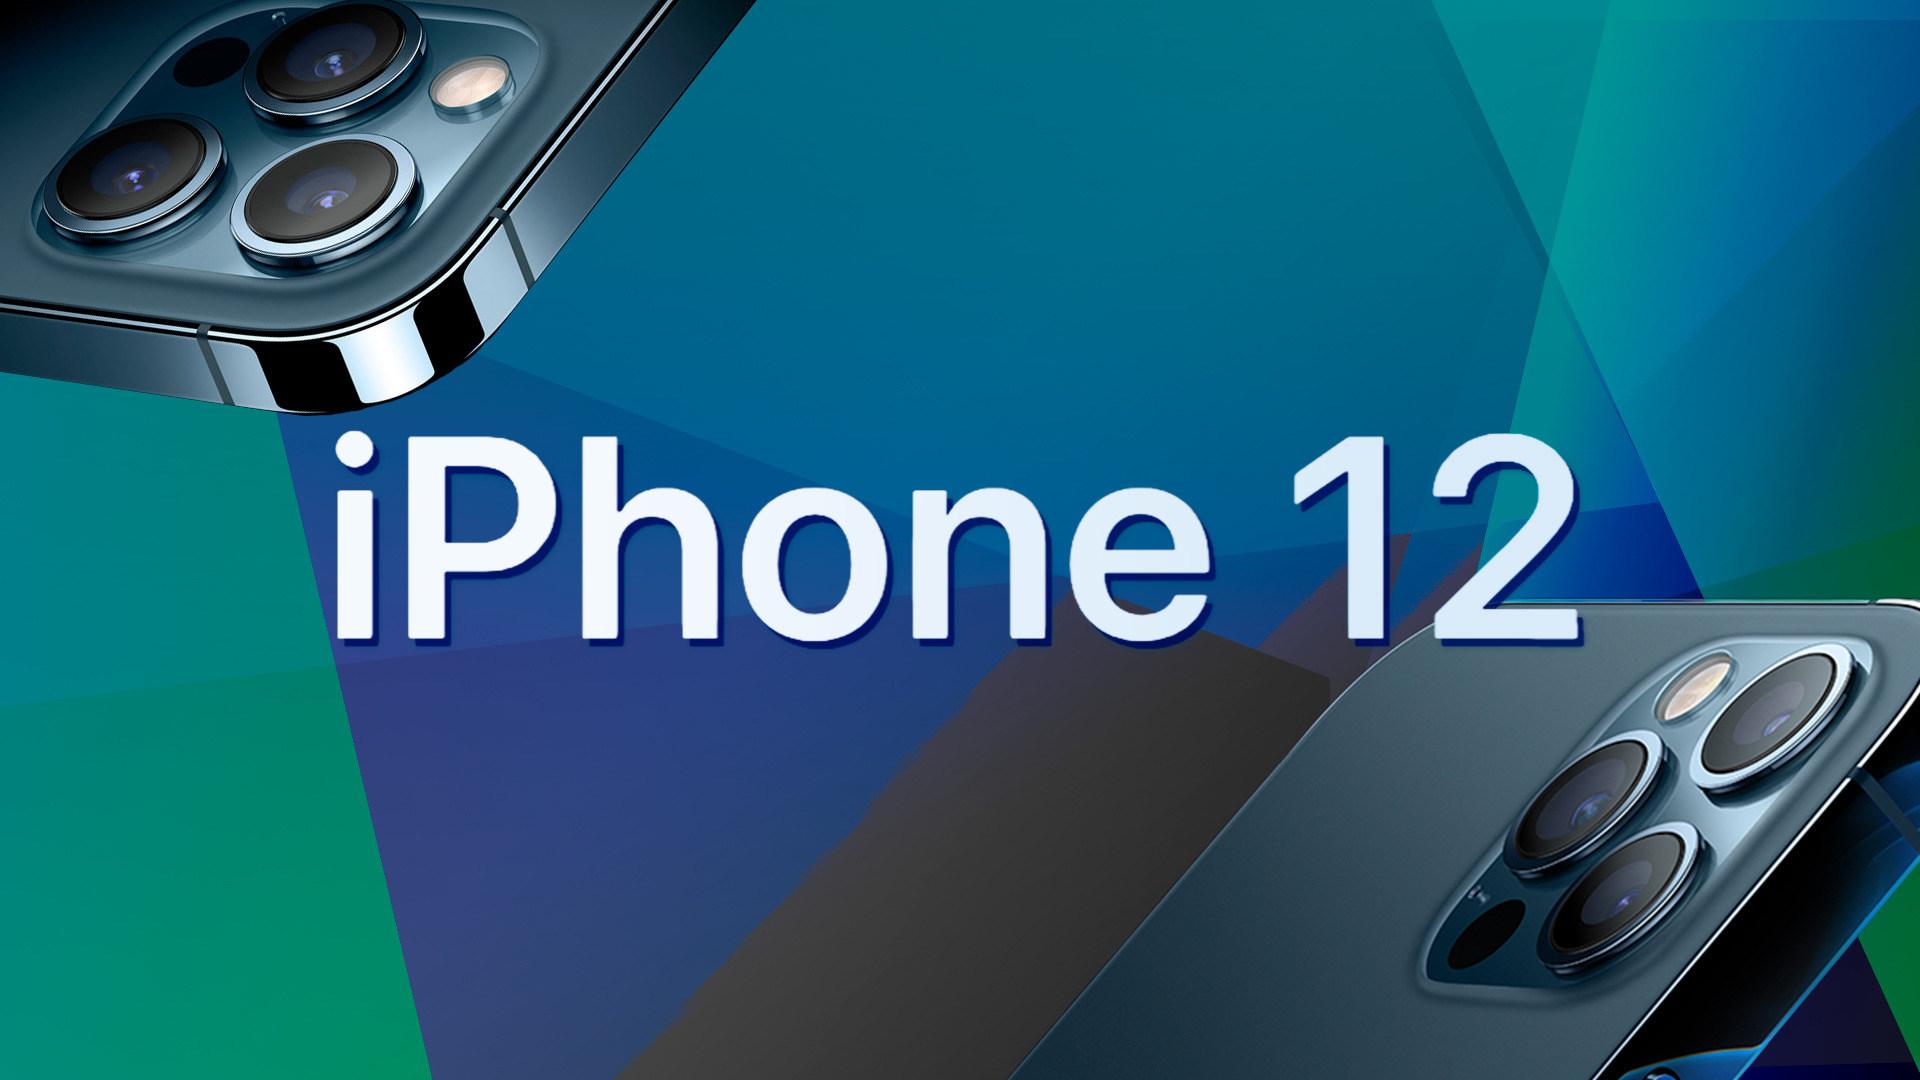 Apple, Iphone, Apple iPhone, iPhone 12, iPhone 12 Pro, Apple iPhone 12, iPhone 12 Pro Max, Apple iPhone 12 Pro, Apple iPhone 12 Pro Max